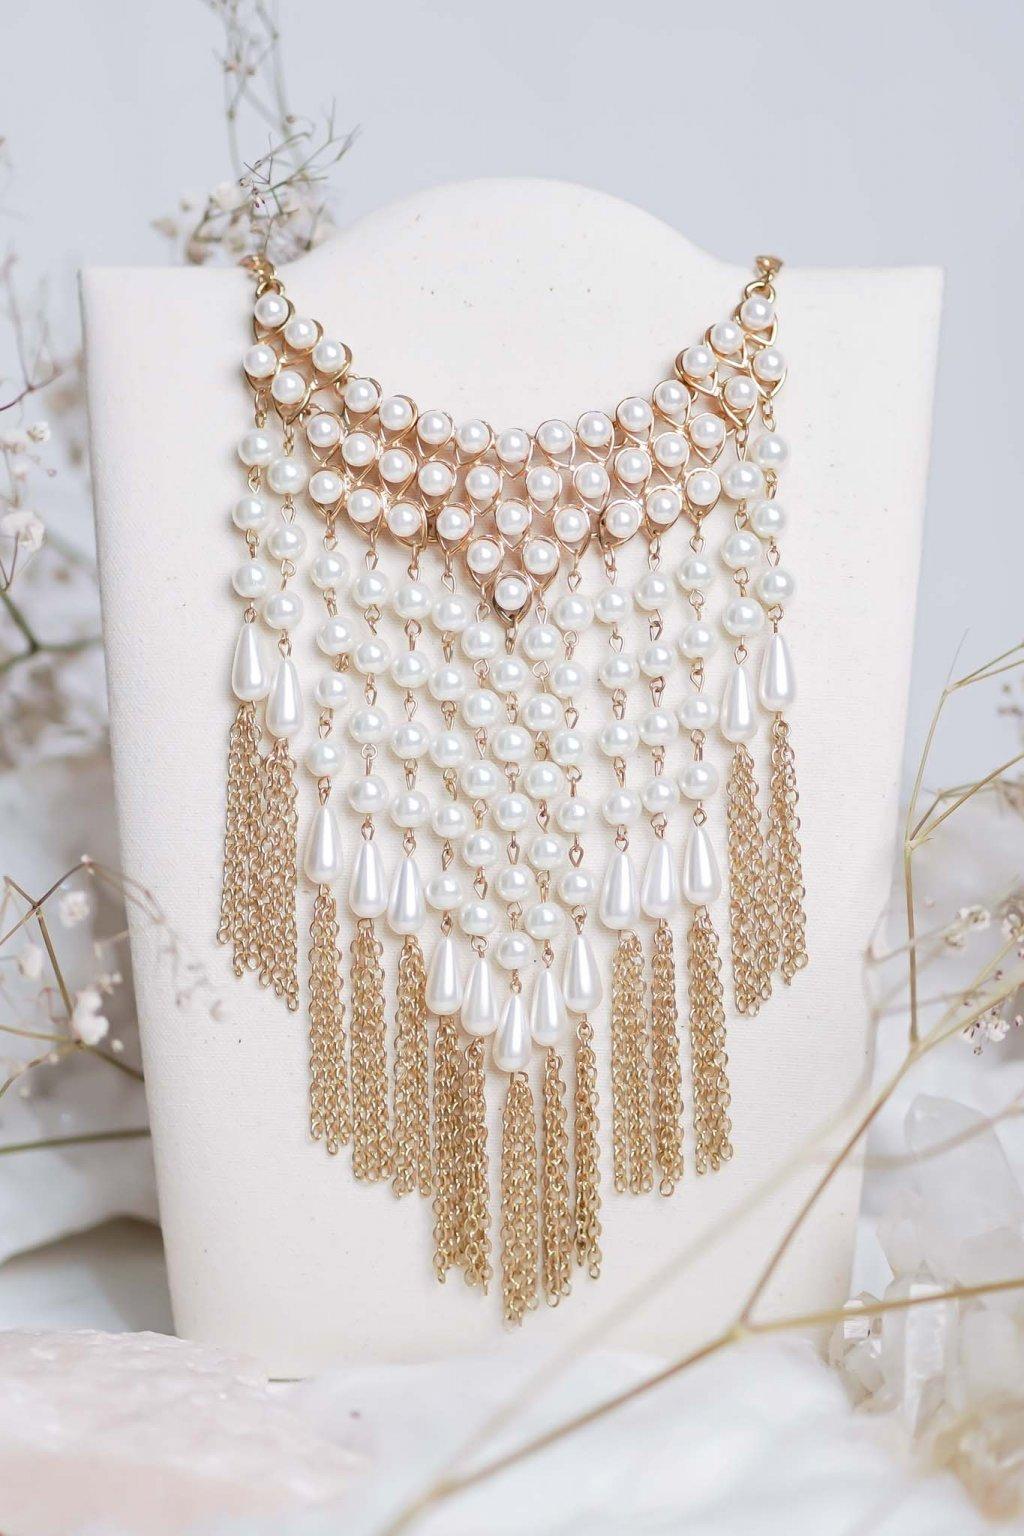 náhrdelník, šperk, spoločenská náhrdelník, náhrdelník na bežný deň, výrazný náhrdelník, jemný náhrdelník, šperky, náhrdelník na ples, svadbu, stužkovú 09